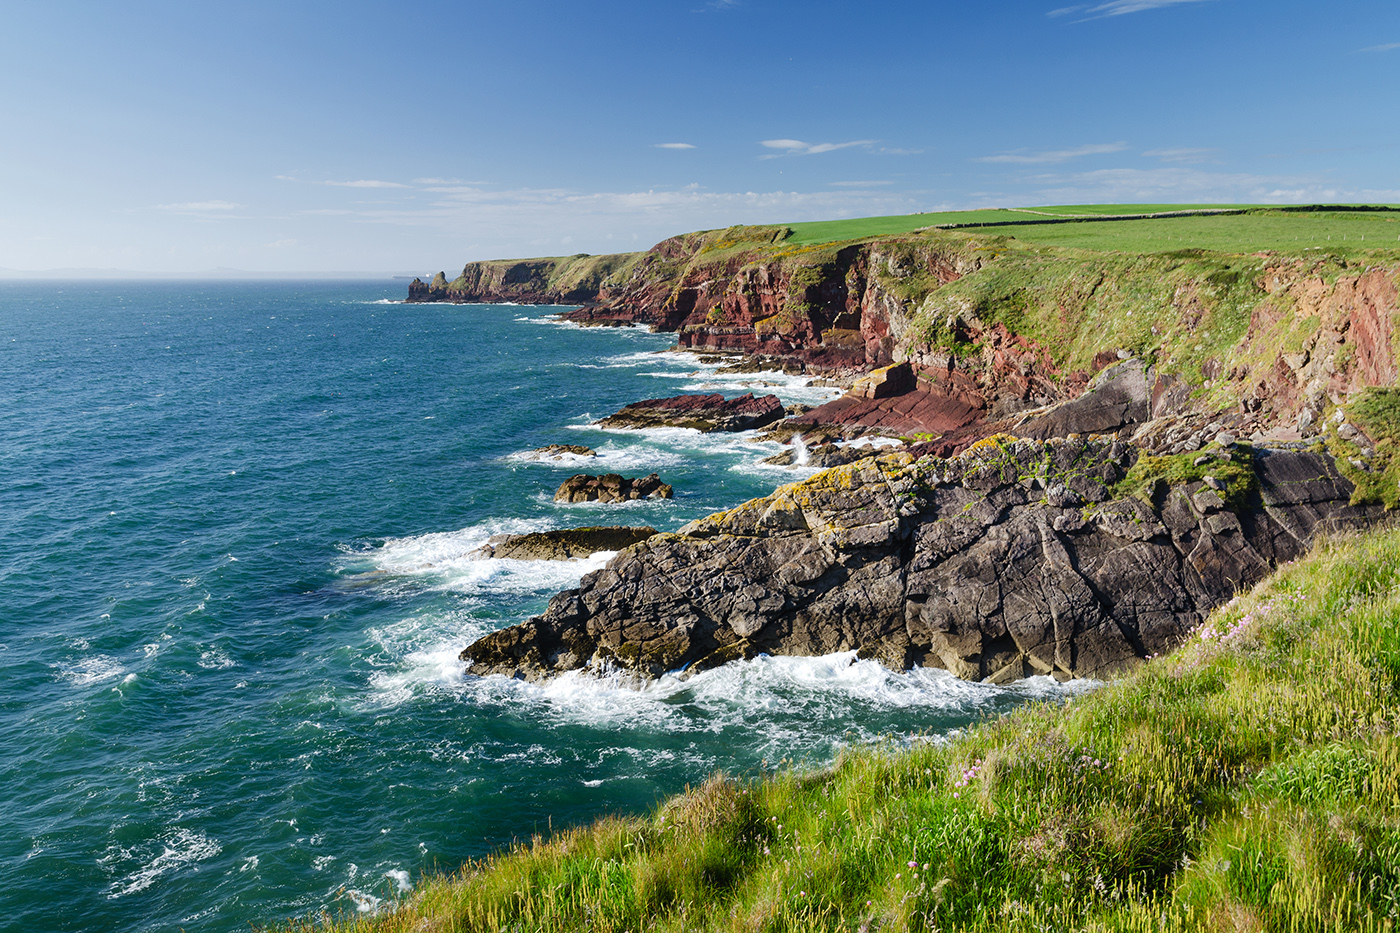 Waves crashing into the rocks on the Pembrokeshire Coast